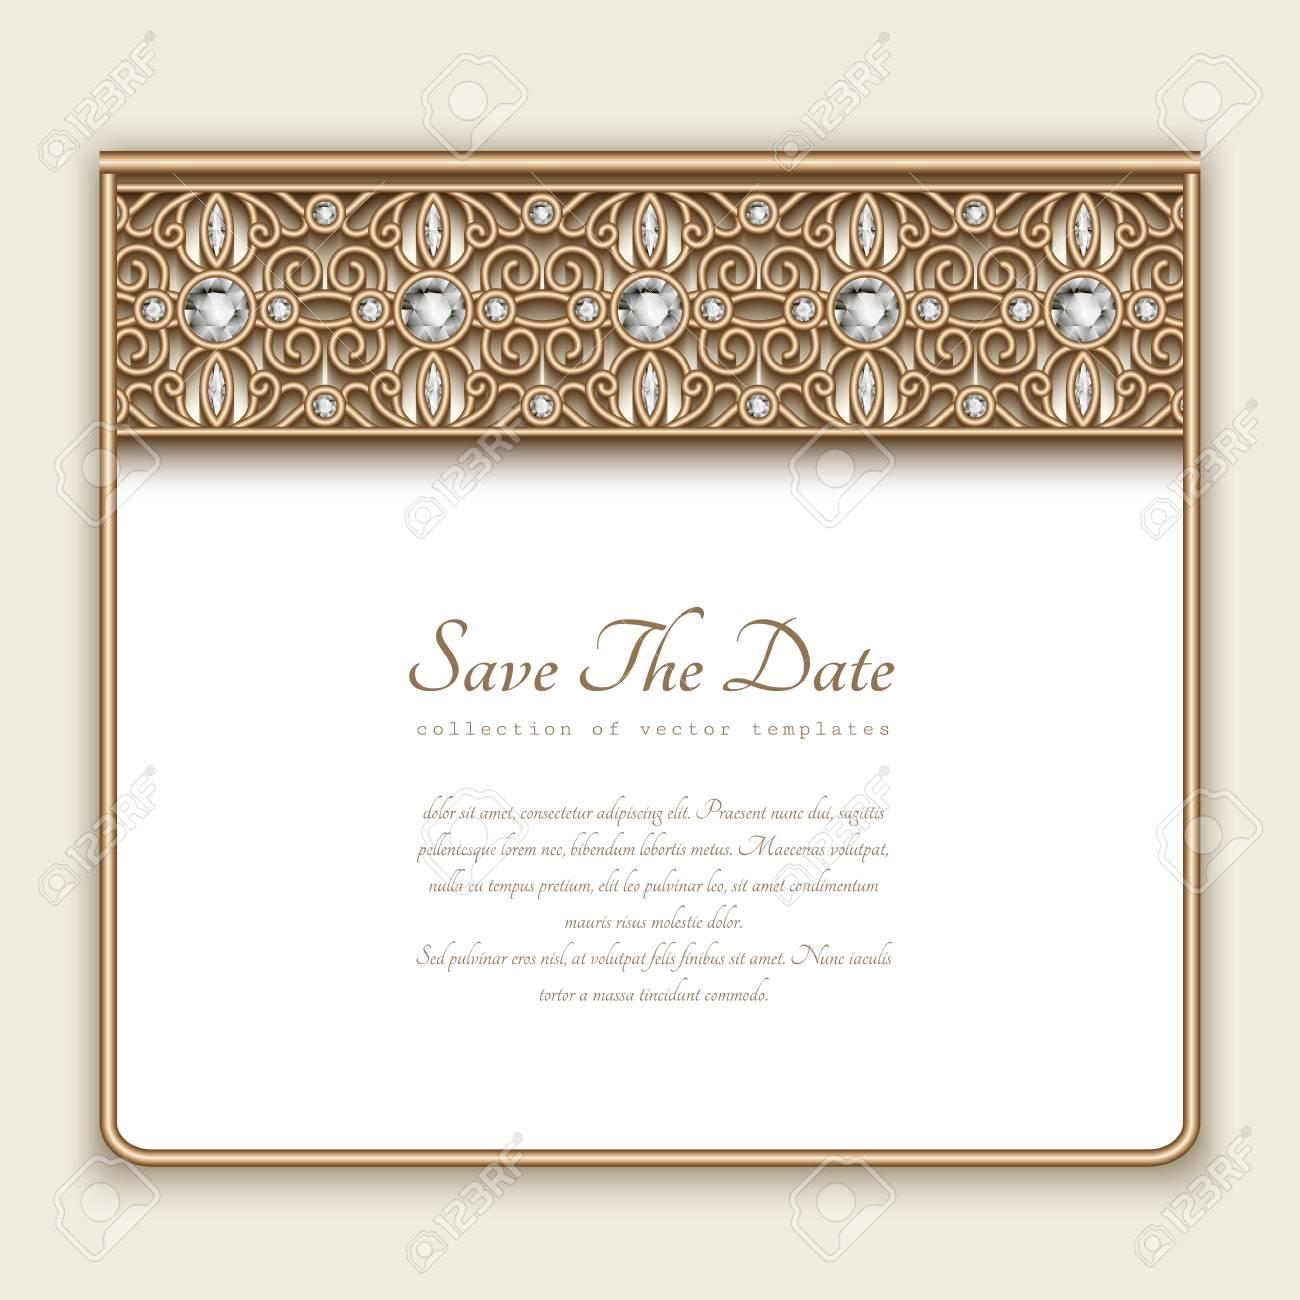 Vintage Gold Card With Diamond Jewelry Border Decoration, Wedding ...